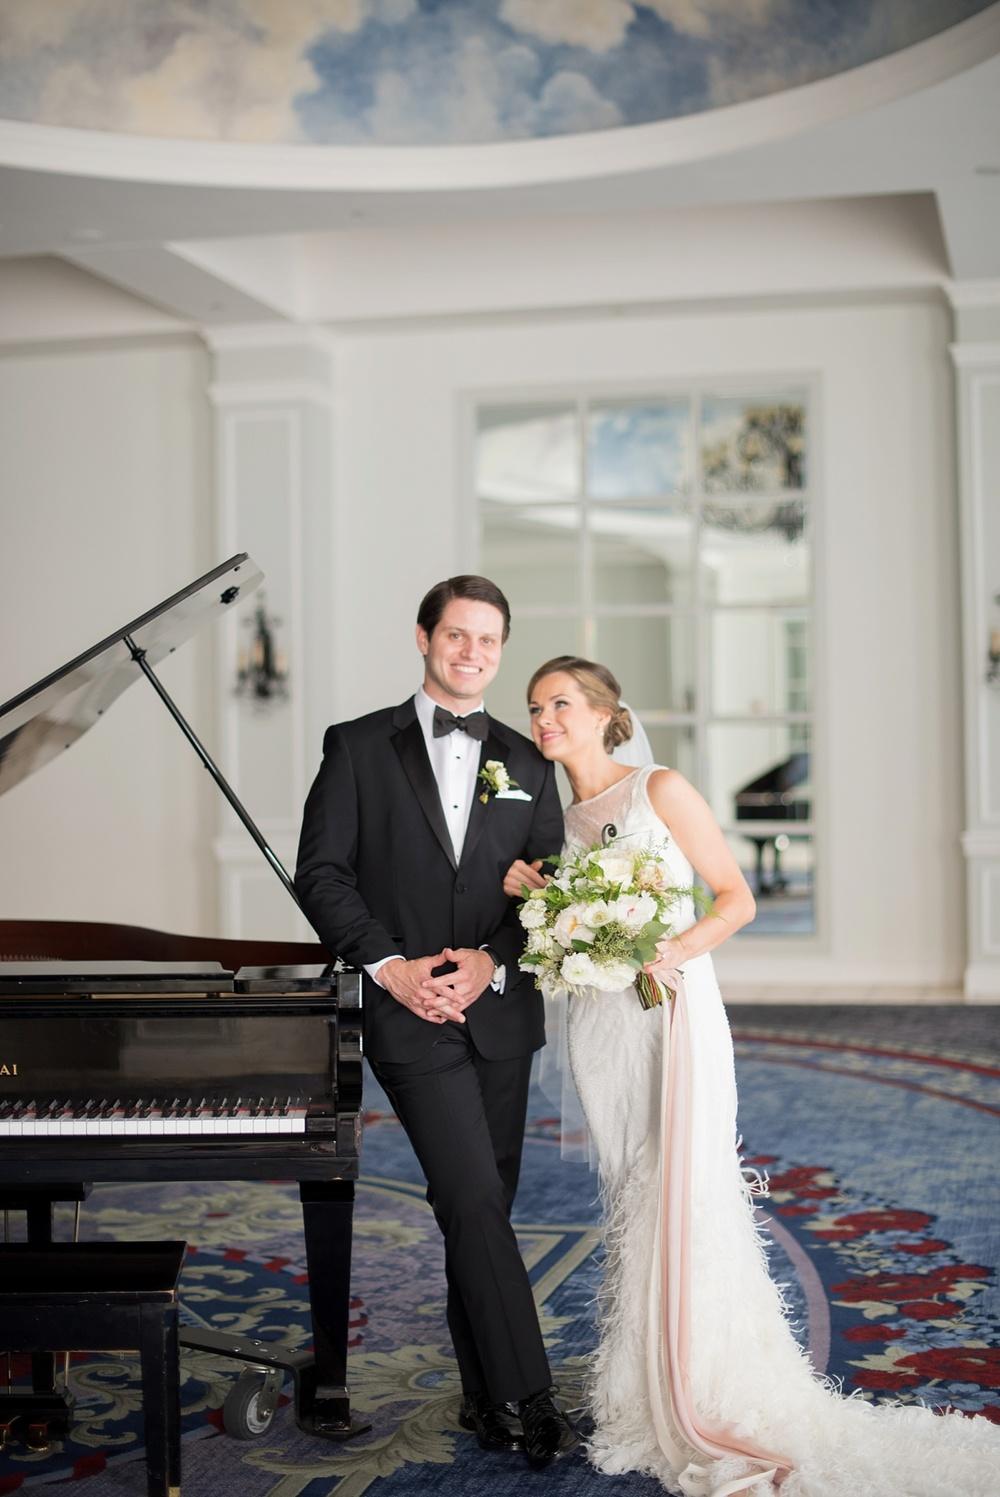 mikkelpaige-full_aperture_floral-pearl_river_hilton_wedding_0001.jpg